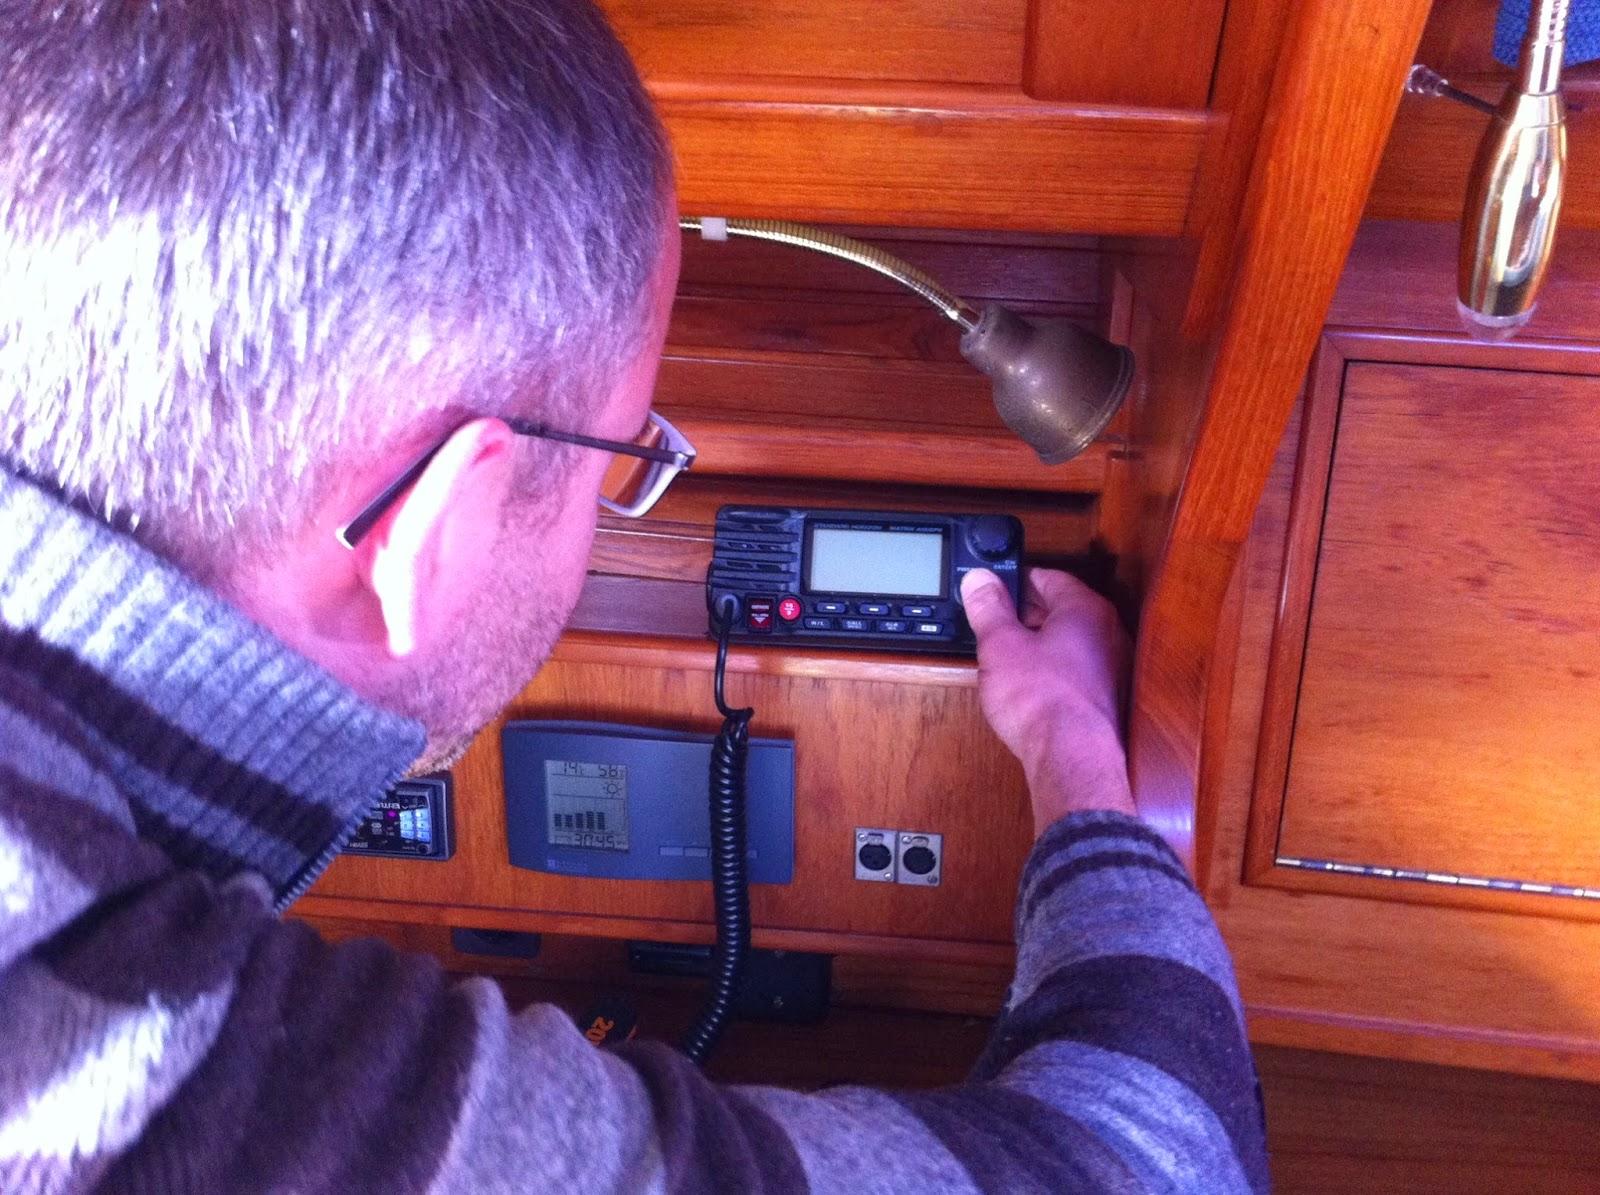 Marifoon met AIS en GPS